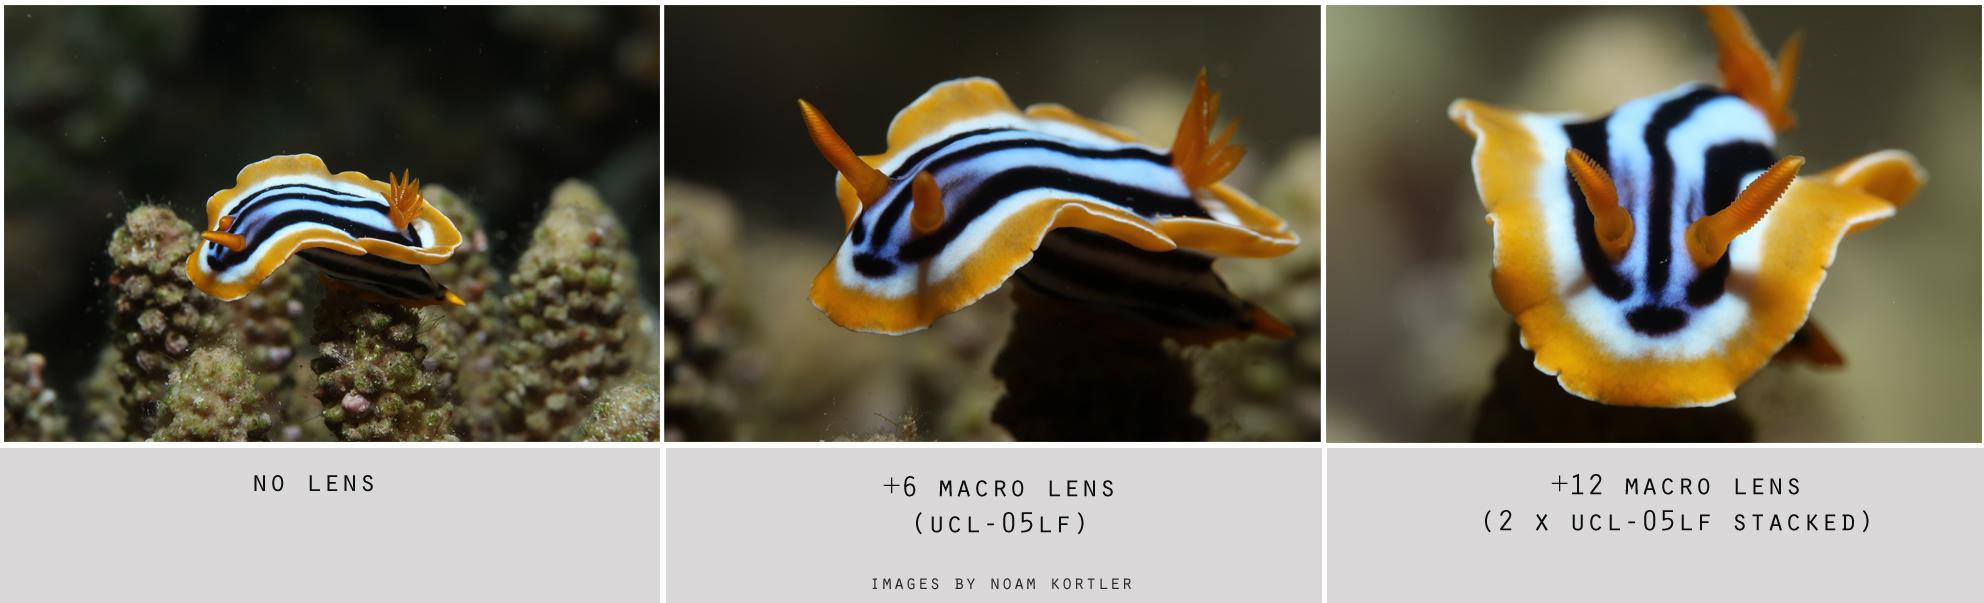 UCL-05LF Wet Macro Lens